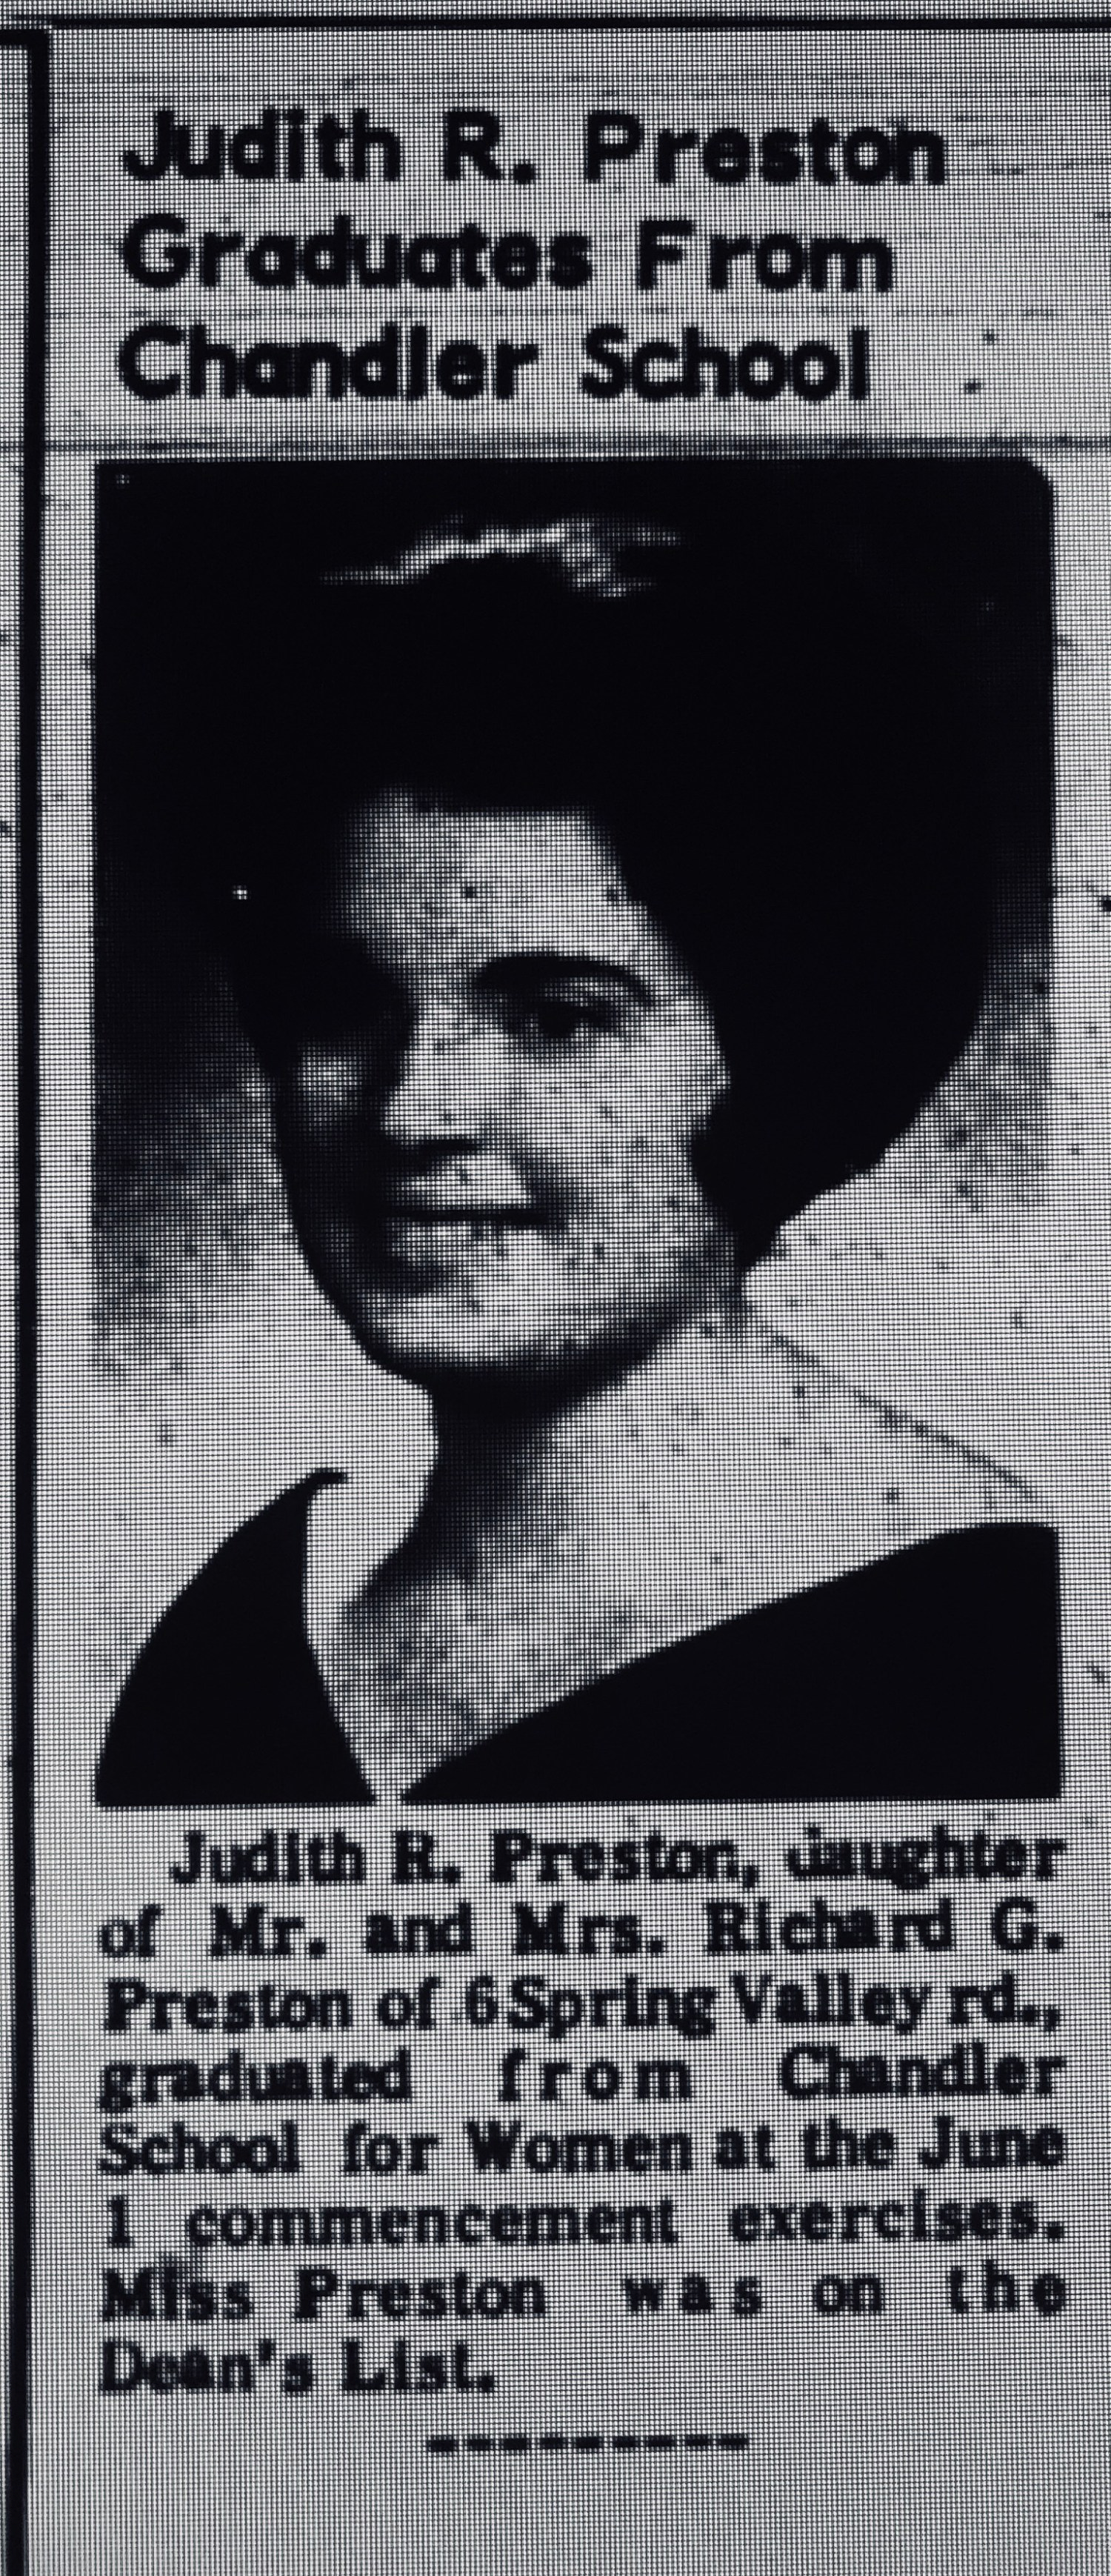 Judith Preston Chandler School Burlington MA